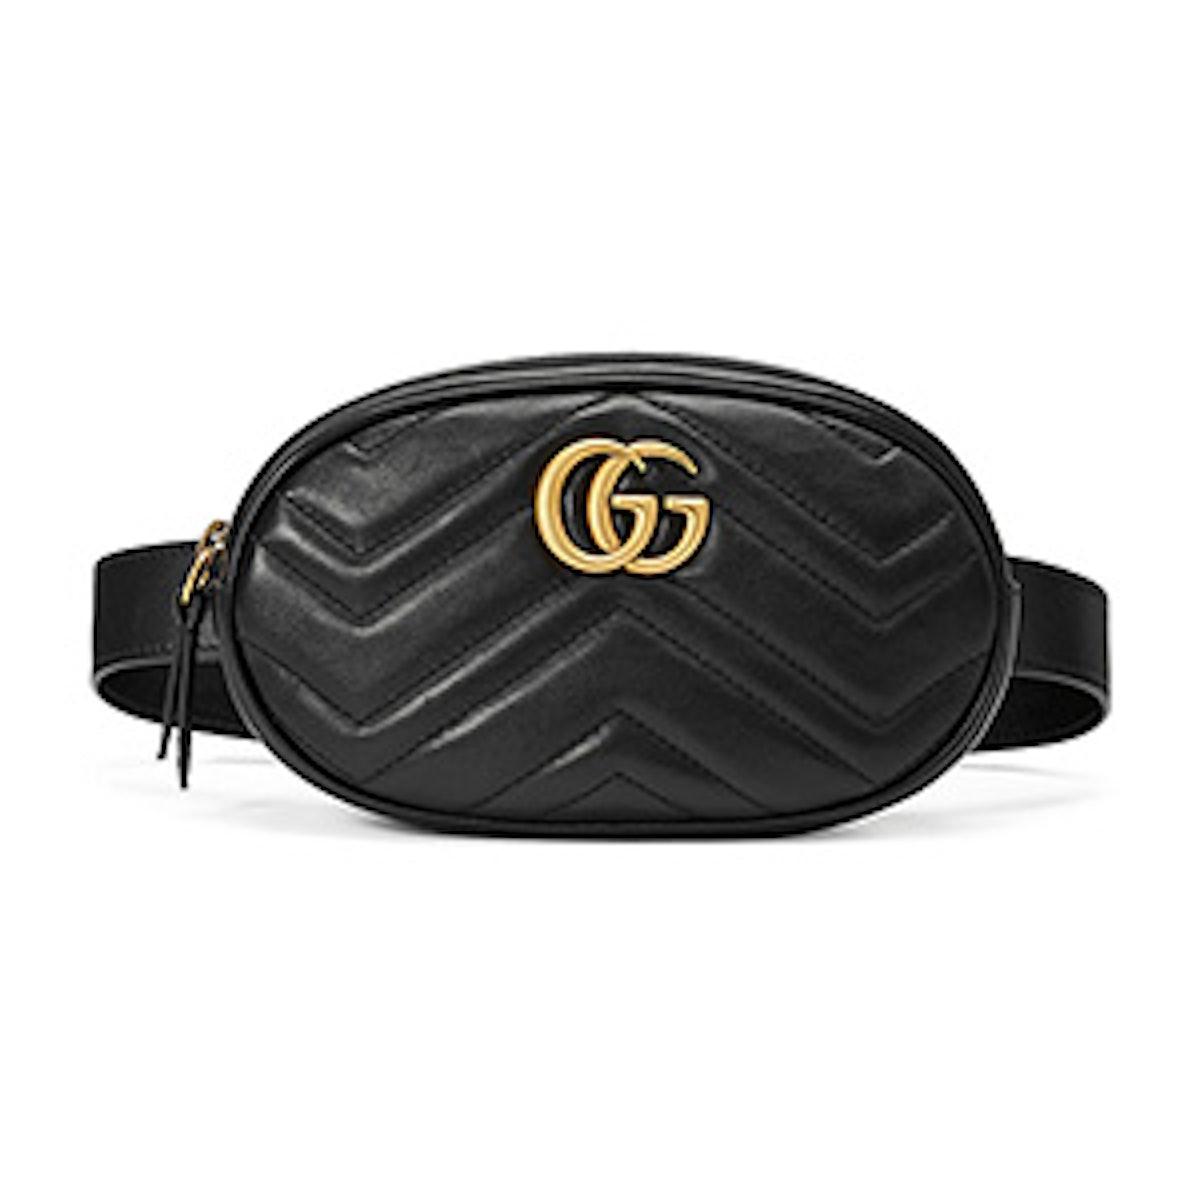 GG Marmont Small Matelassé Leather Belt Bag